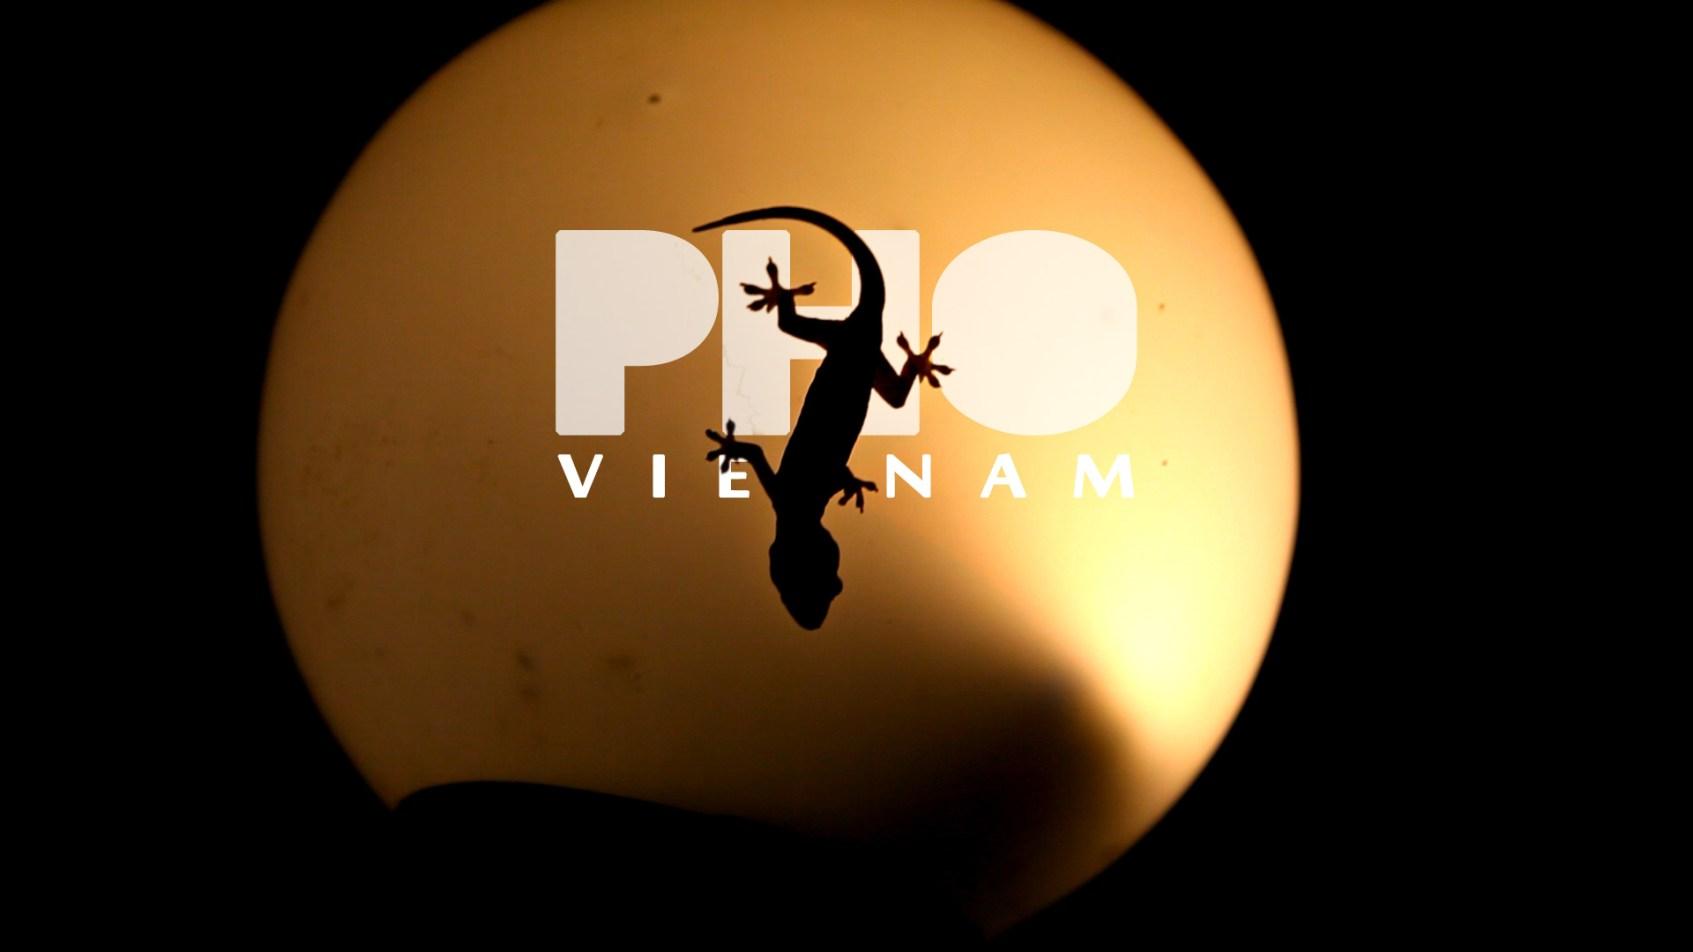 Thumbnail trailer Pho Vietnam (© Kim Le Cao)